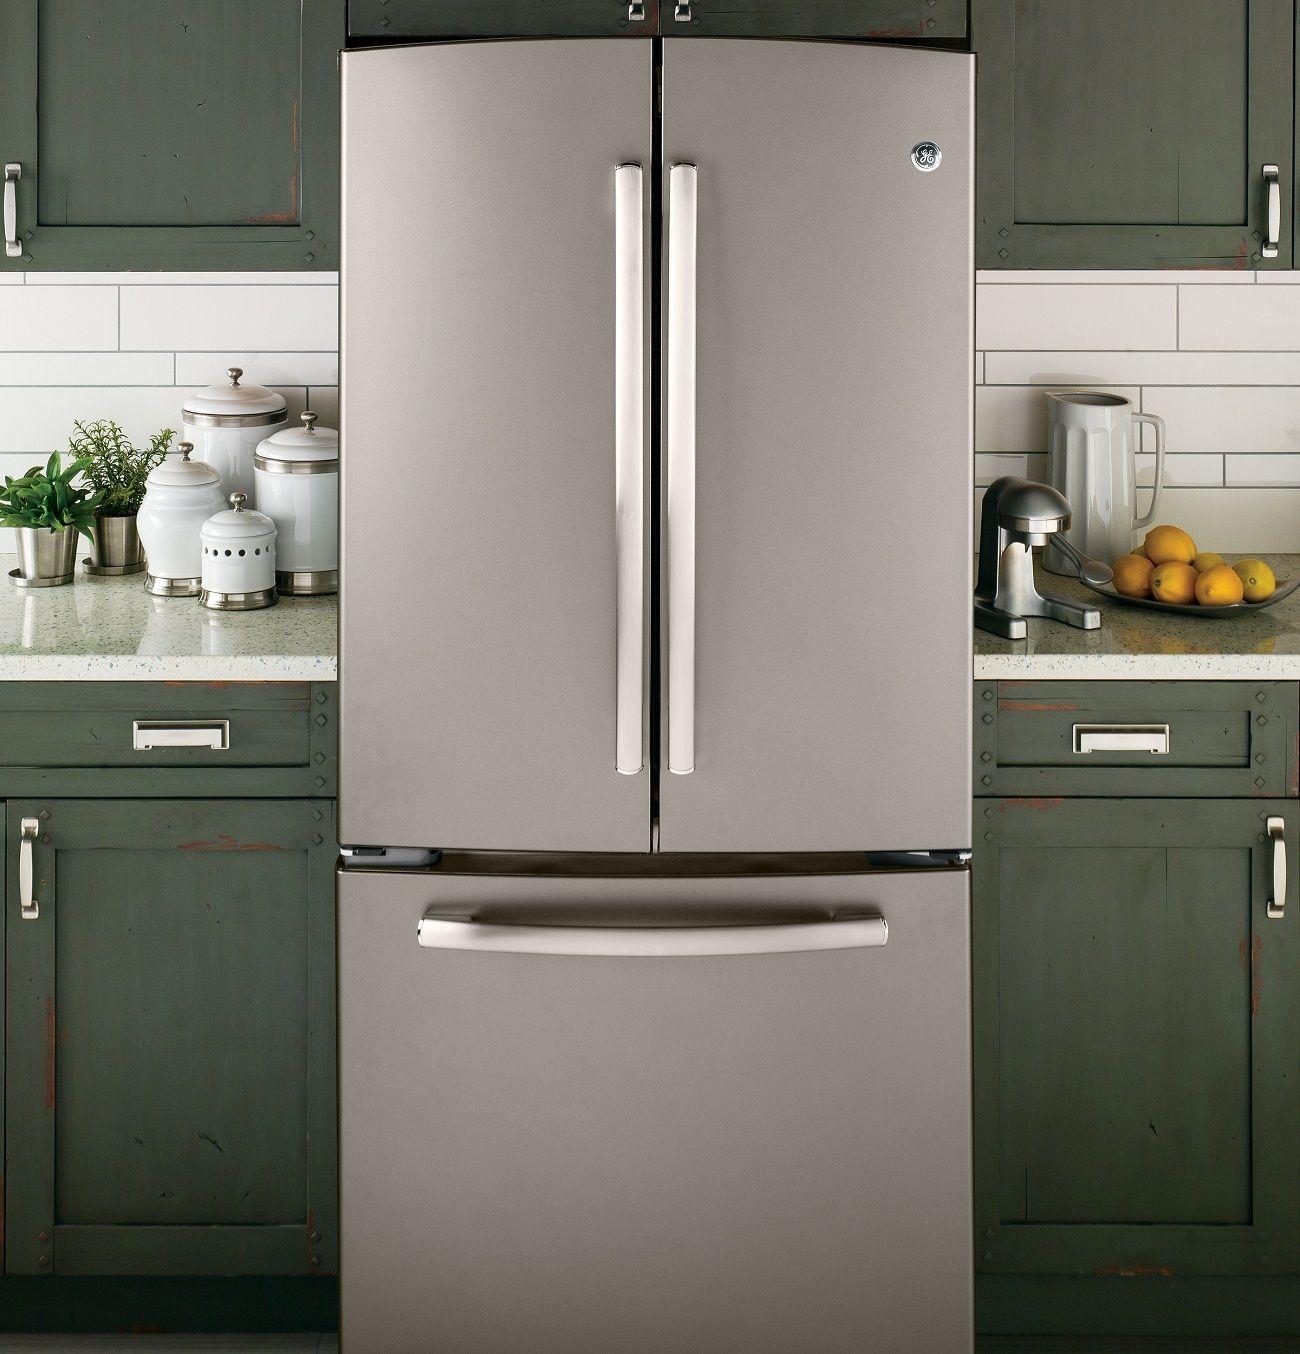 Pnr22lsefes Ge Appliances Kitchen Inspiration Design Slate Appliances Kitchen Slate Finish Appliances